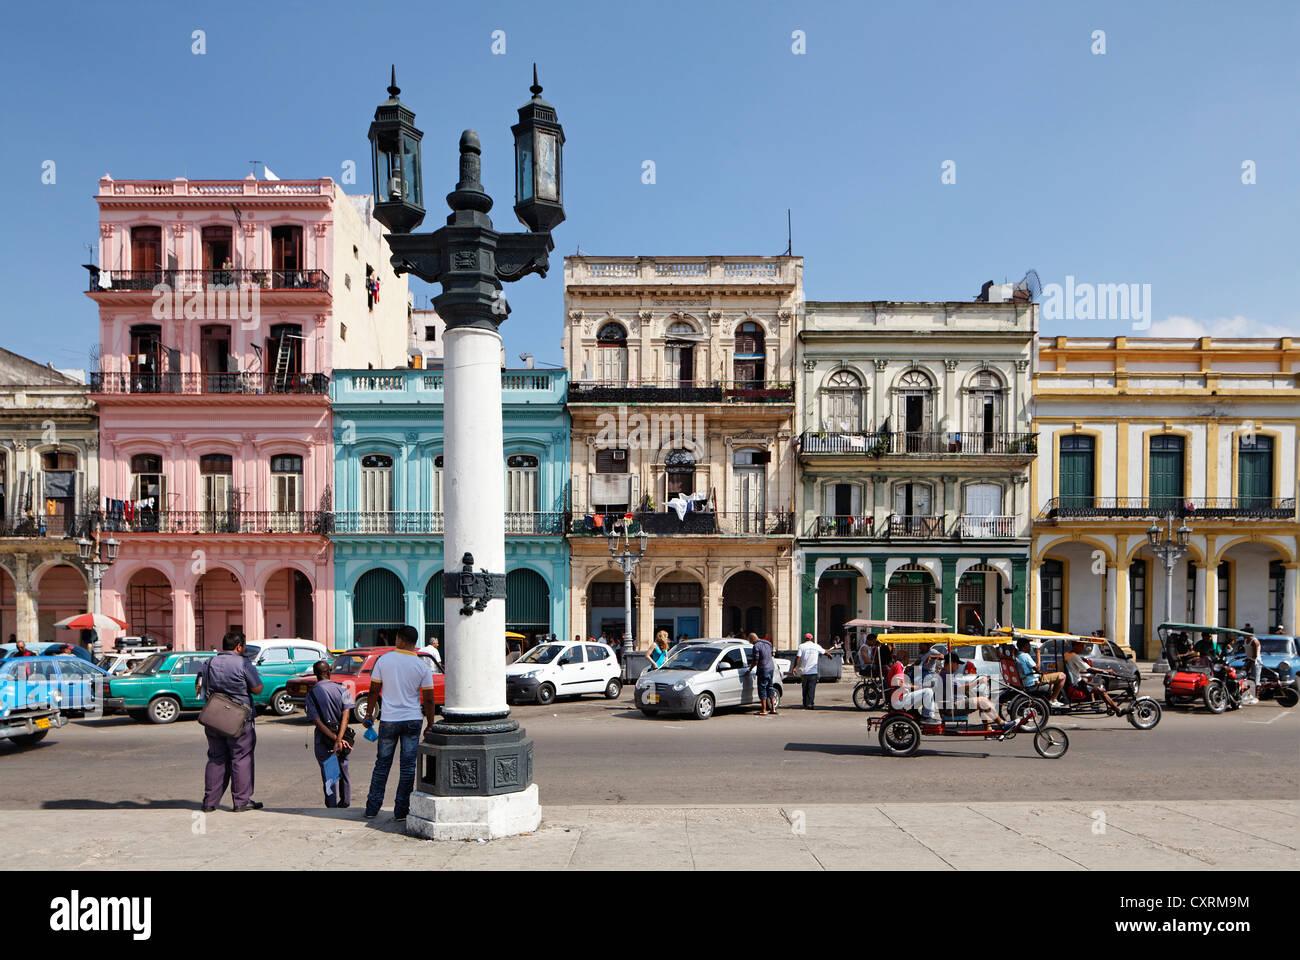 Street with row of houses, candelabra lantern, Villa San Cristobal de La Habana, old town, La Habana, Havana - Stock Image